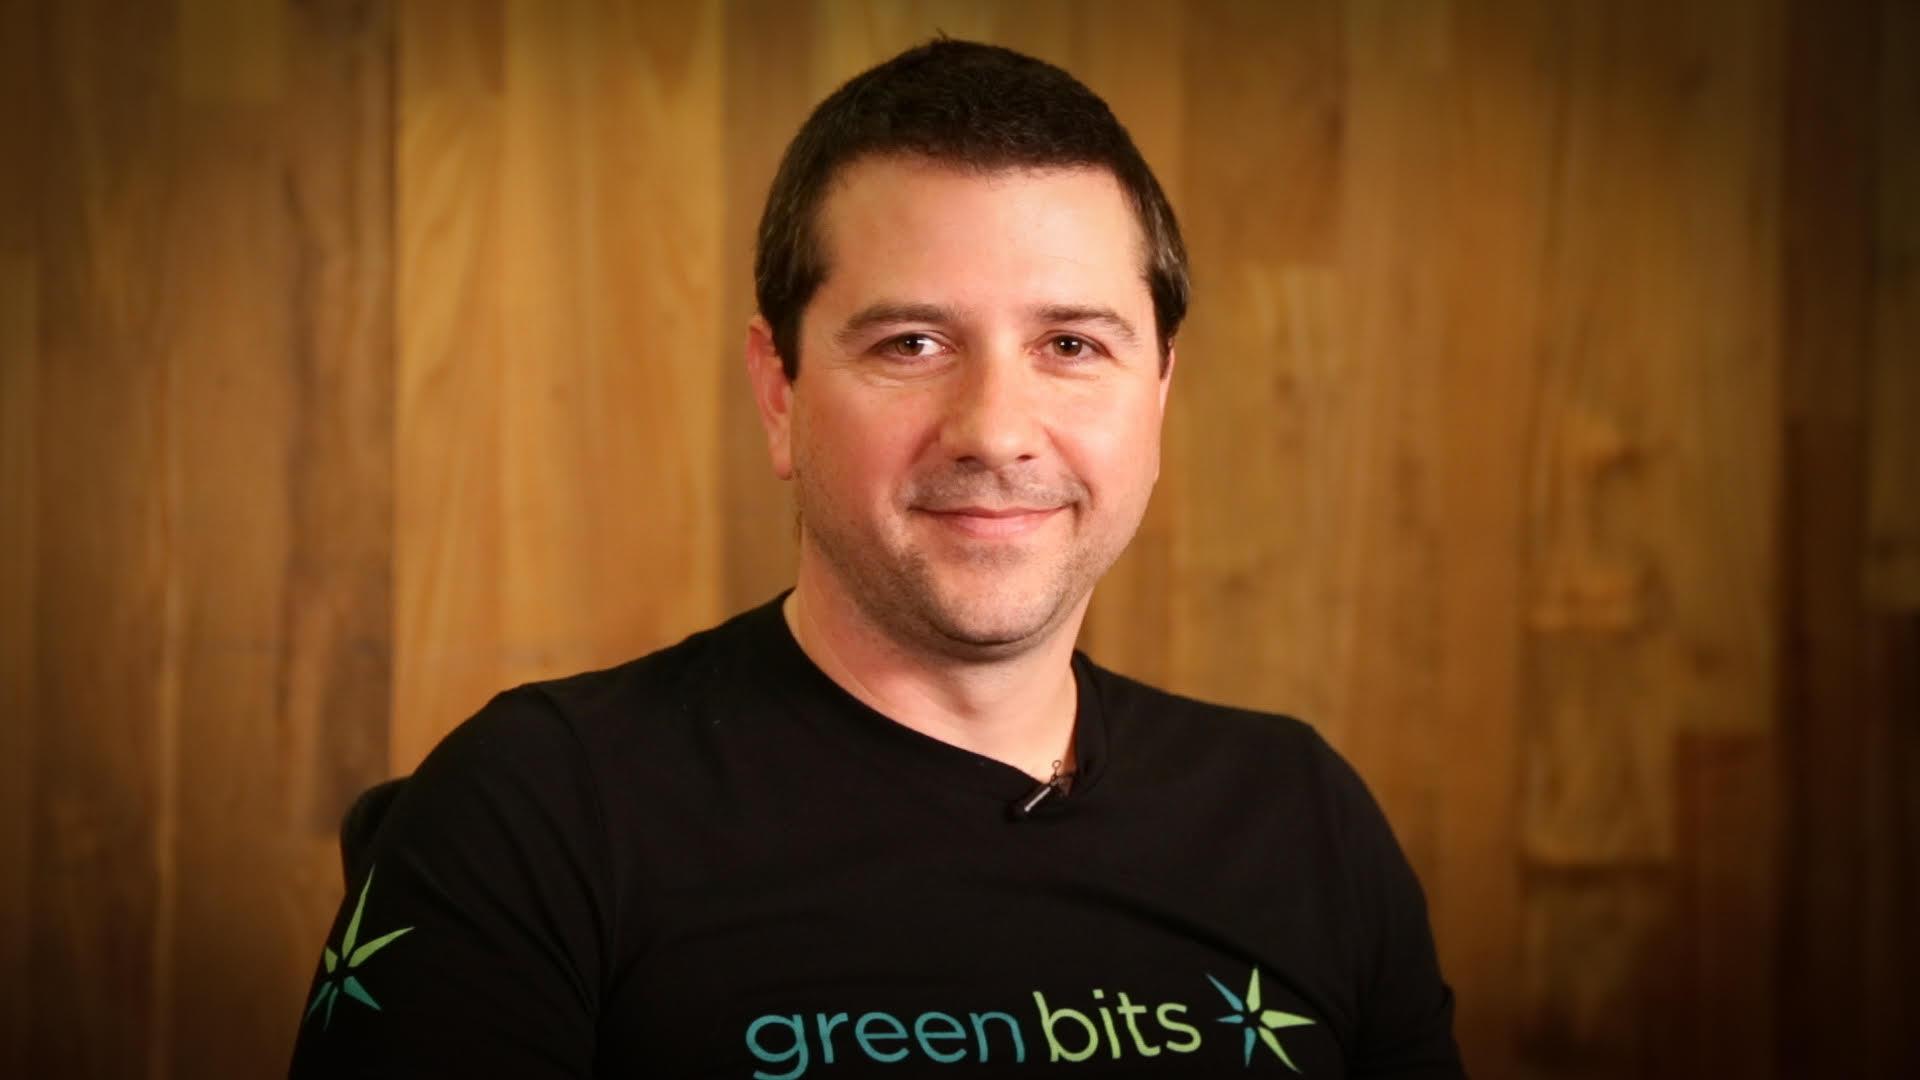 BEN CURREN CEO of GREEN BITS